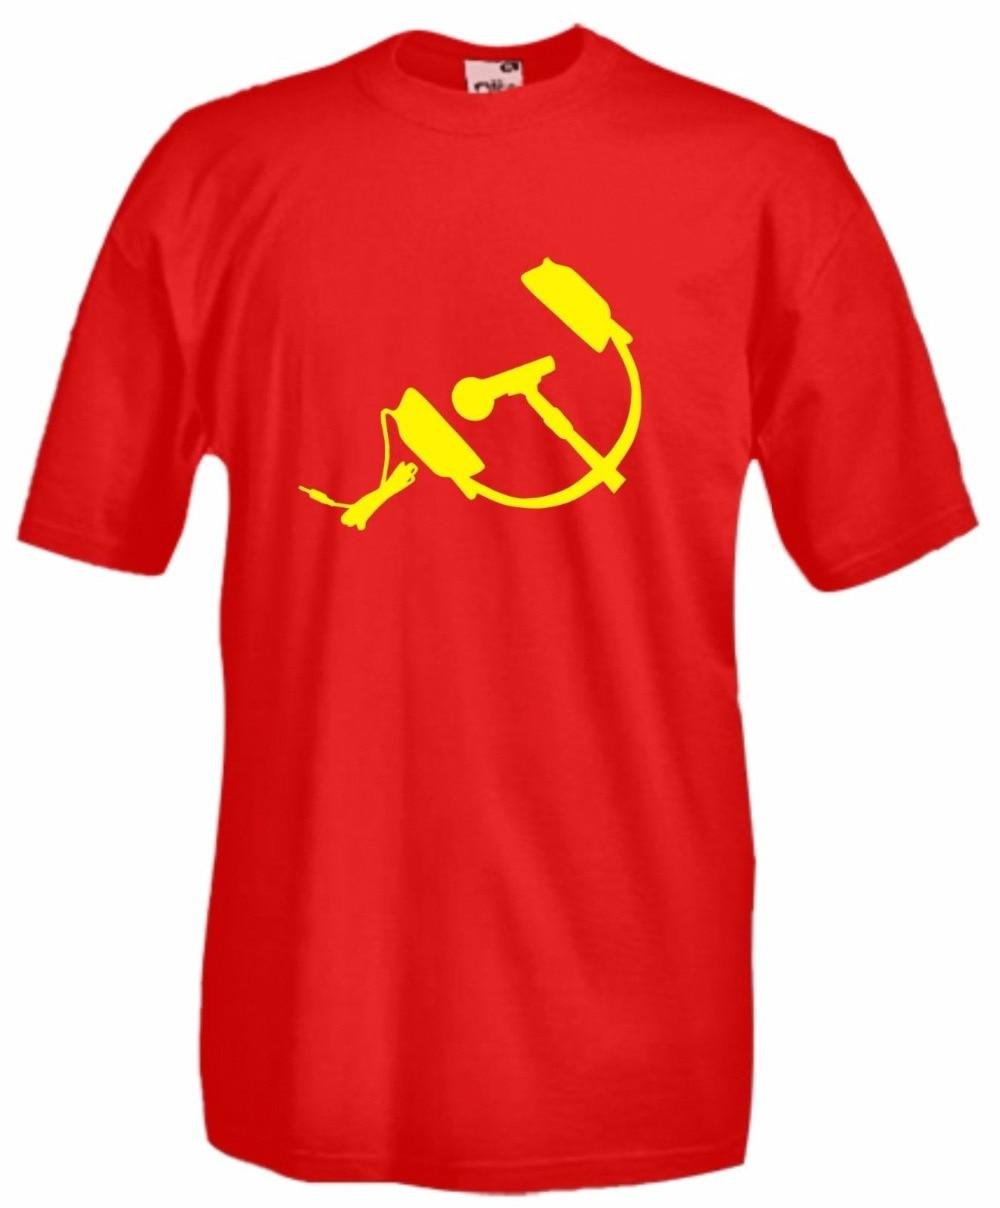 2018  High Quality Tee Shirt T-Shirt Shirt Funny Microphone  Headphone Hammer  Sickle Summer Cotton T-shirt